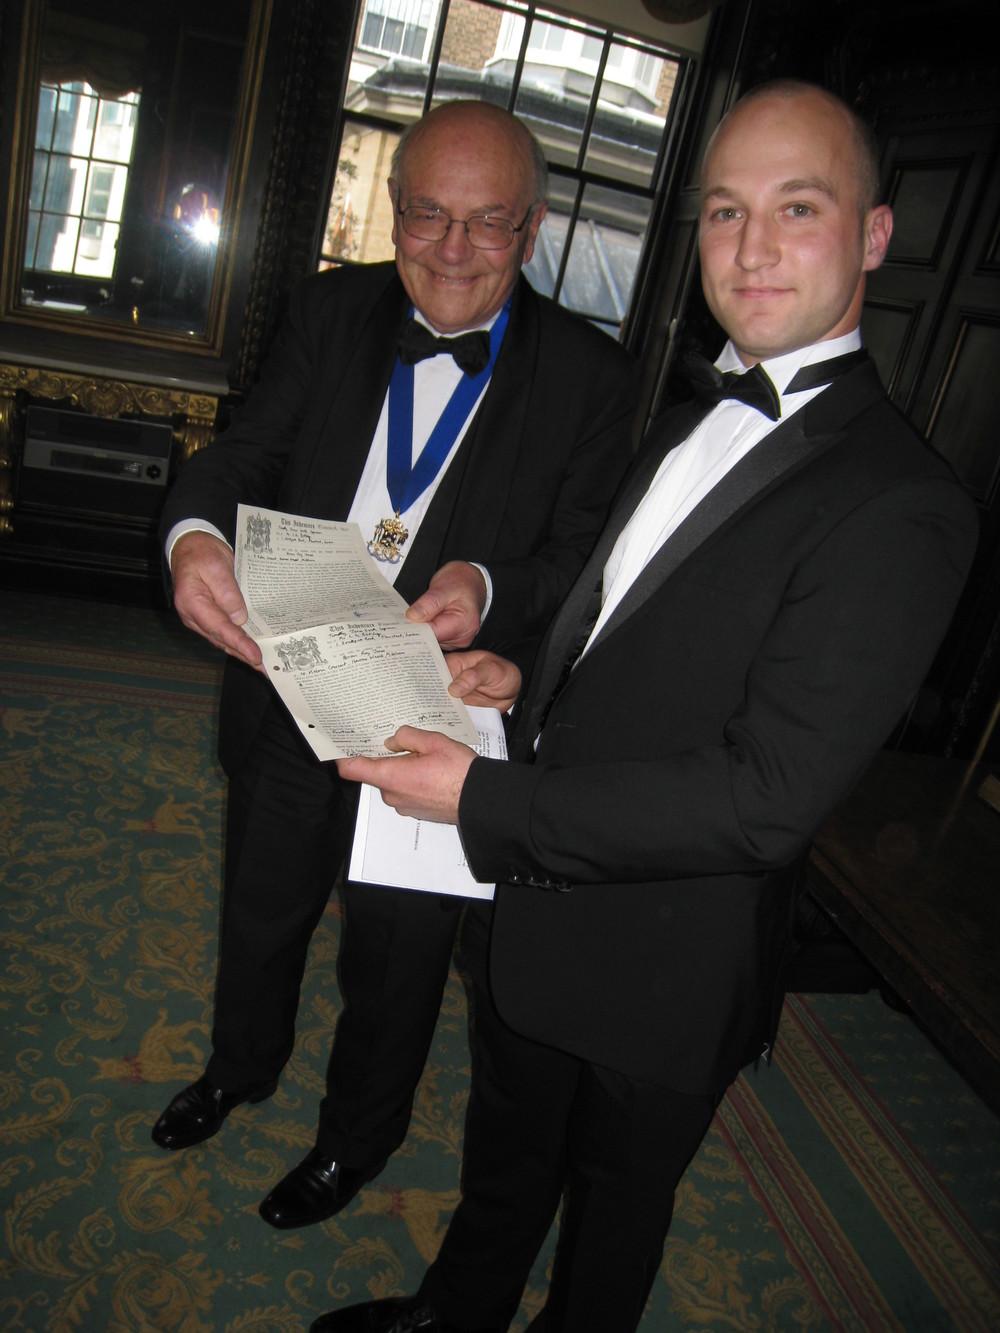 PME Brian Jones with his Apprentice Timothy Copeman